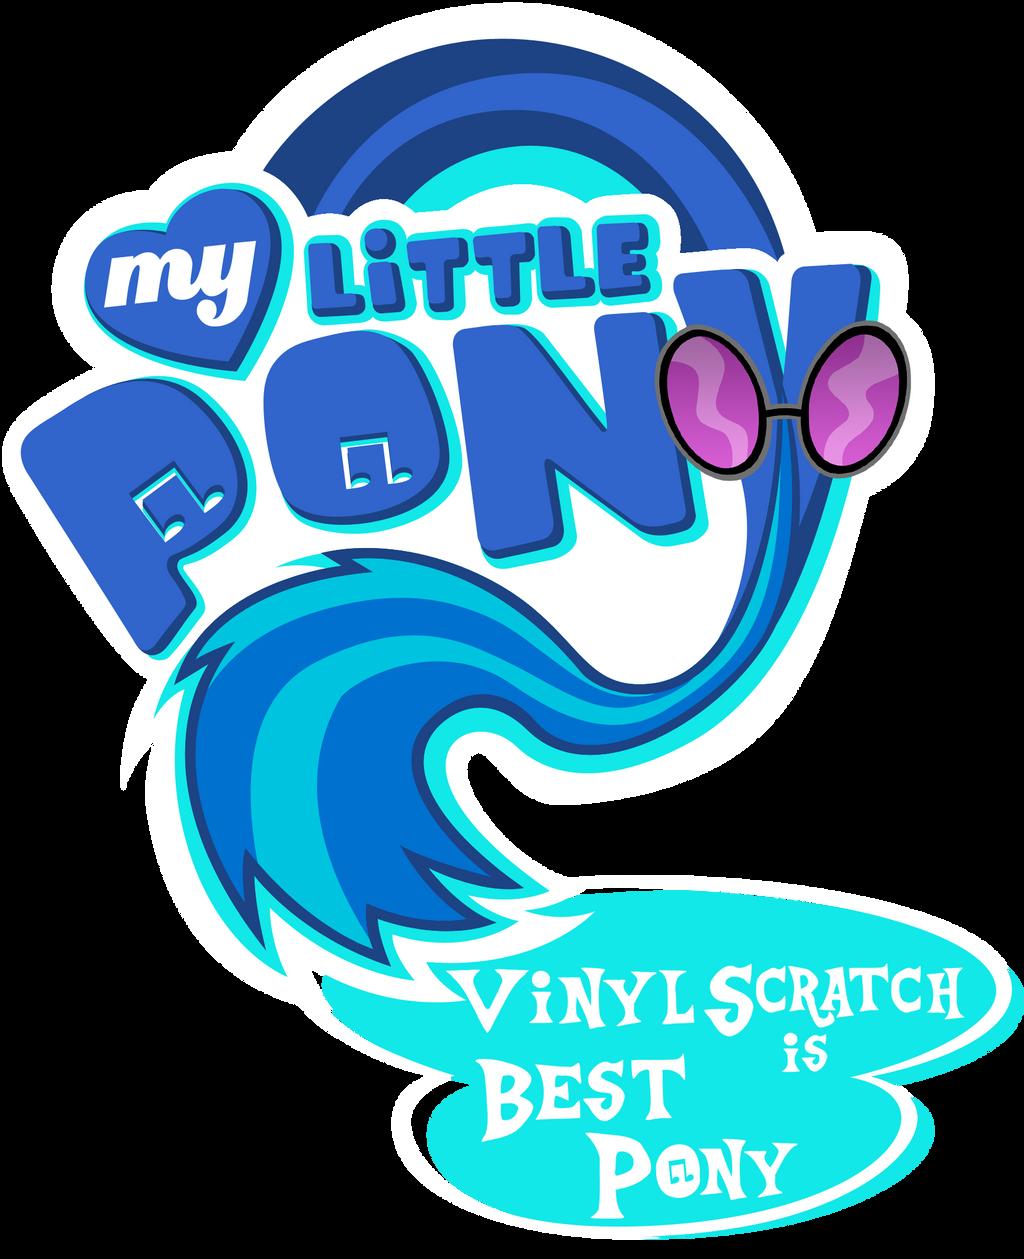 Fanart - MLP. My Little Pony Logo - Vinyl Scratch by jamescorck